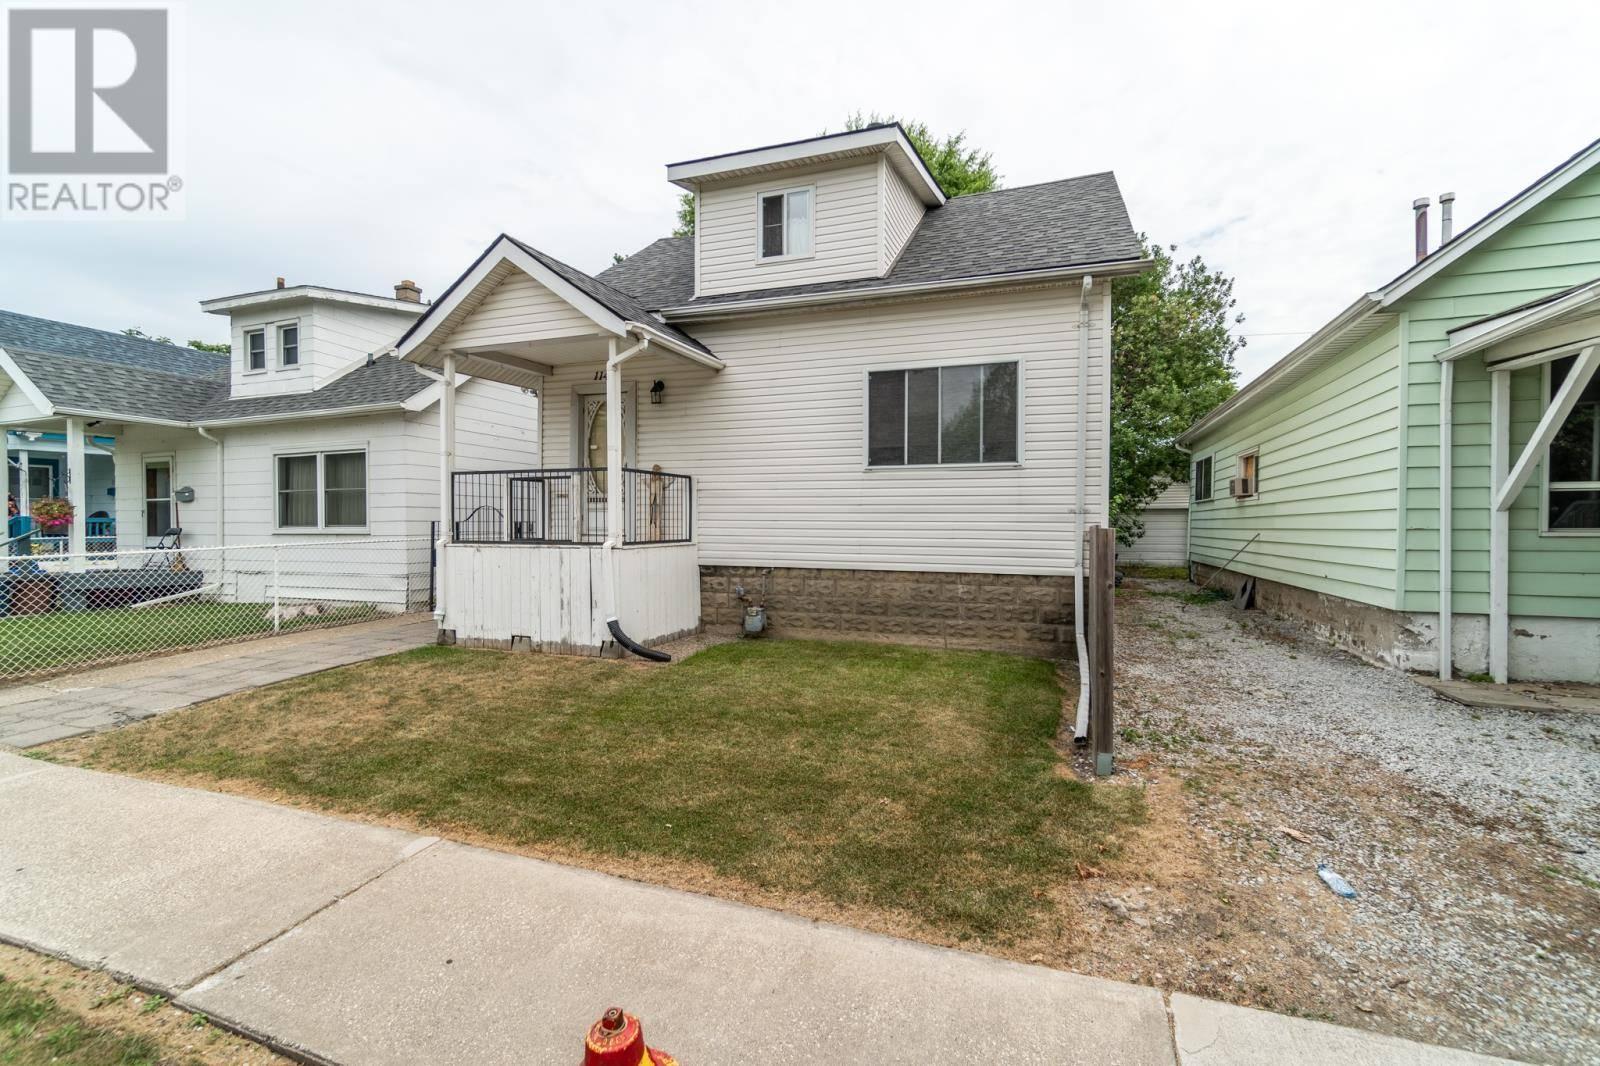 House for sale at 1146 St Luke Road  Windsor Ontario - MLS: 19026094